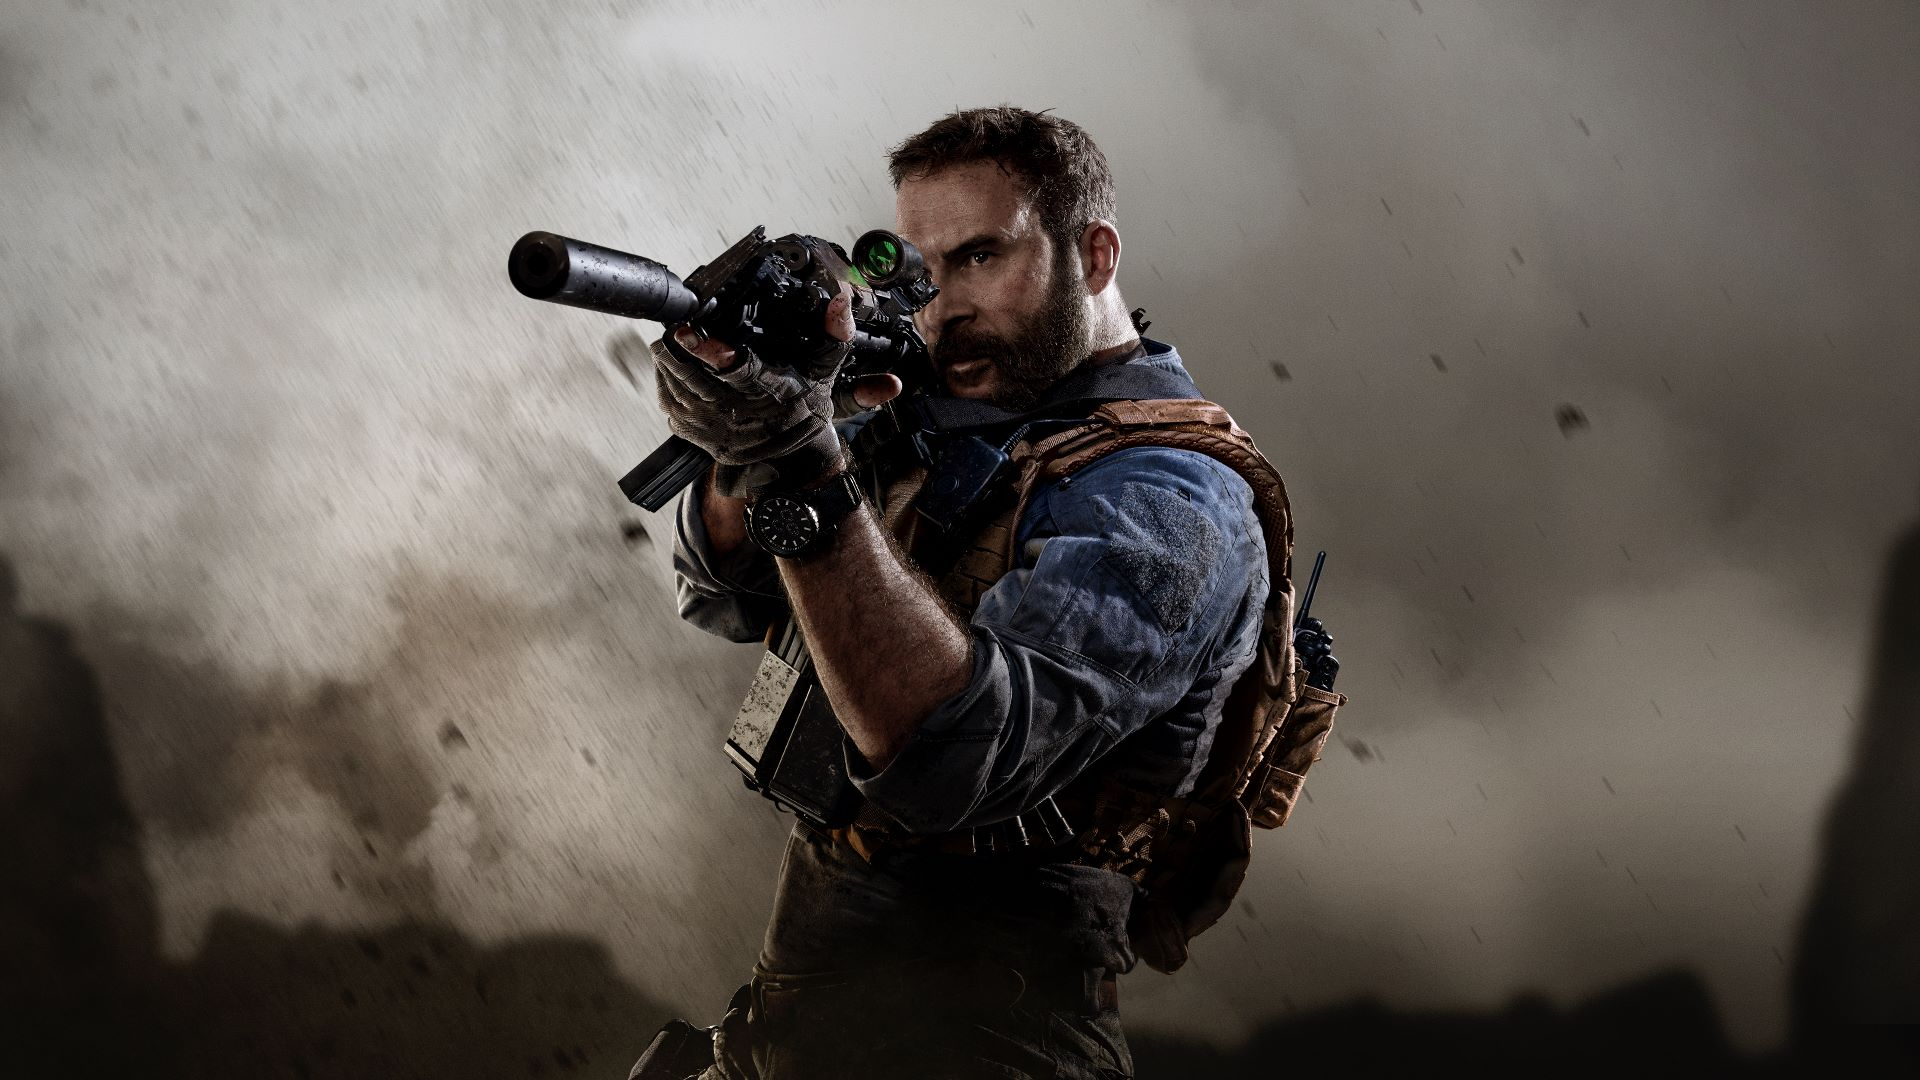 Call of Duty 1382019 2